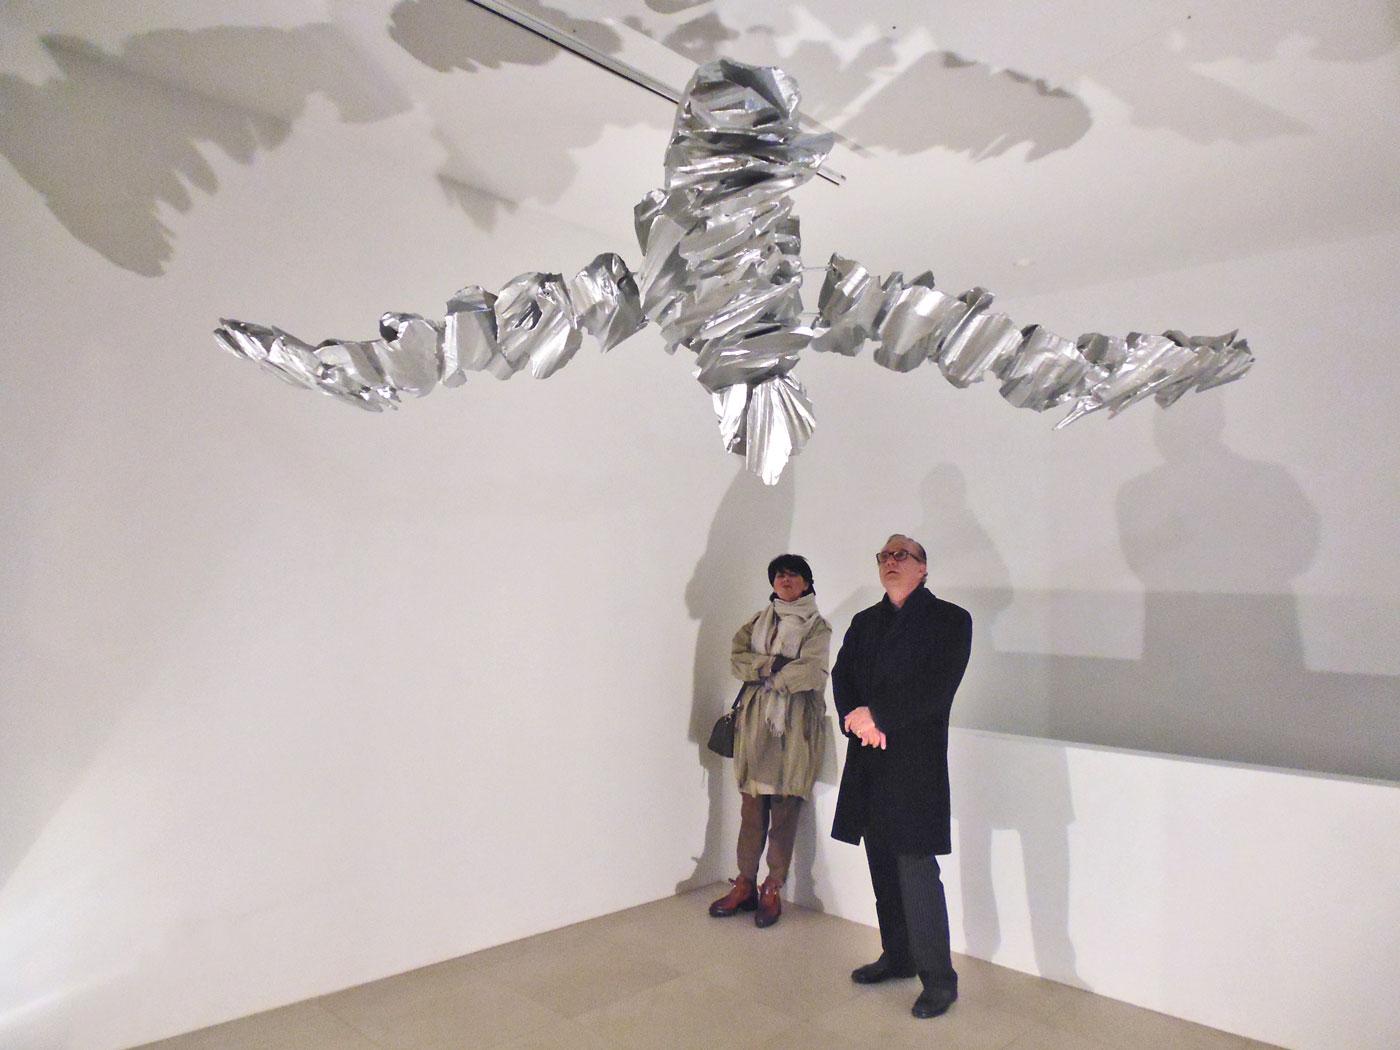 SWAN MOBILÉ,  © 2011-2013,  styrofoam, lined with paper, aluminium powder in acrylic, fishing line, ceiling motor, 50 x 320 x 220 cm